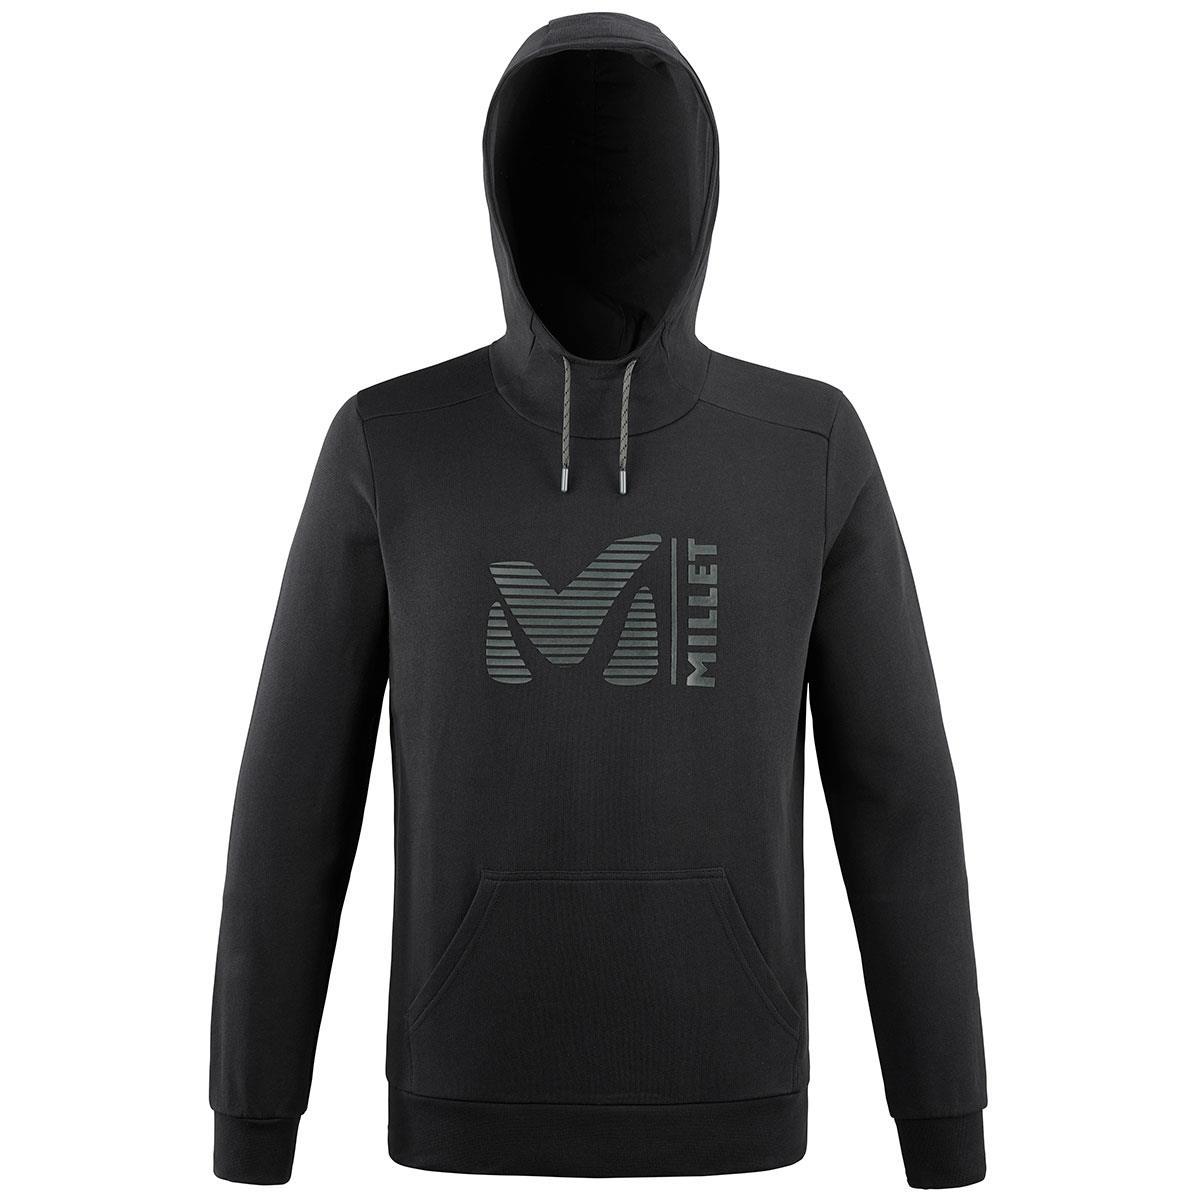 Millet MILLET Sweatshirt HD MIV7888